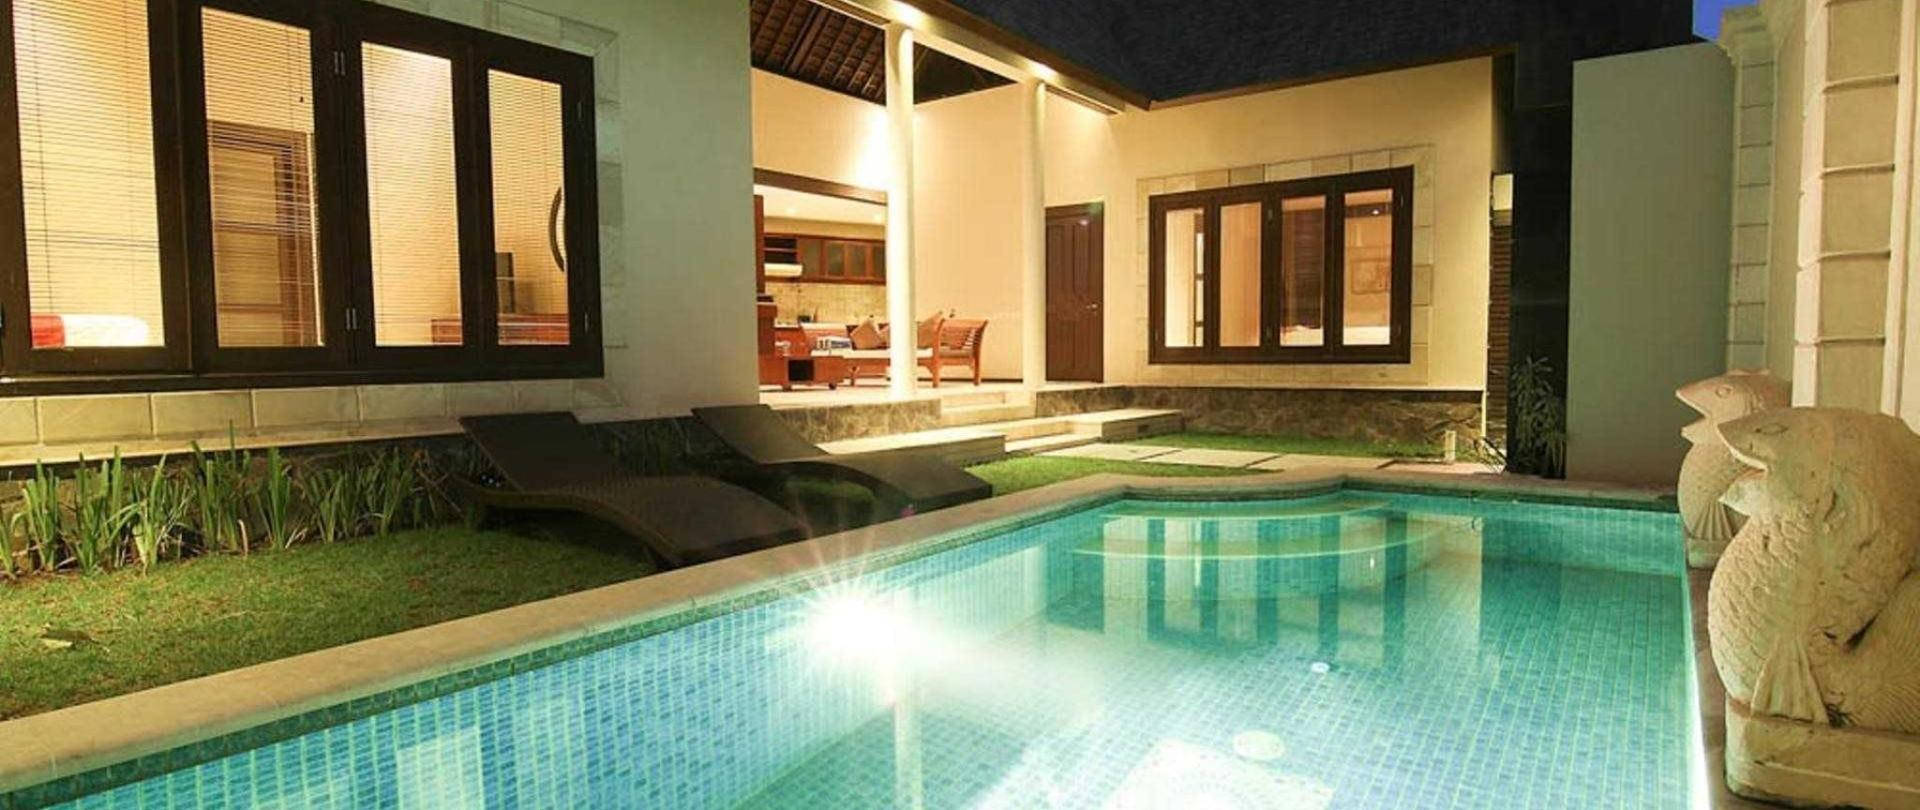 Garden Villa Bali - Seminyak - Indonesia  Garden Villa Bali  Seminyak   Indonesia